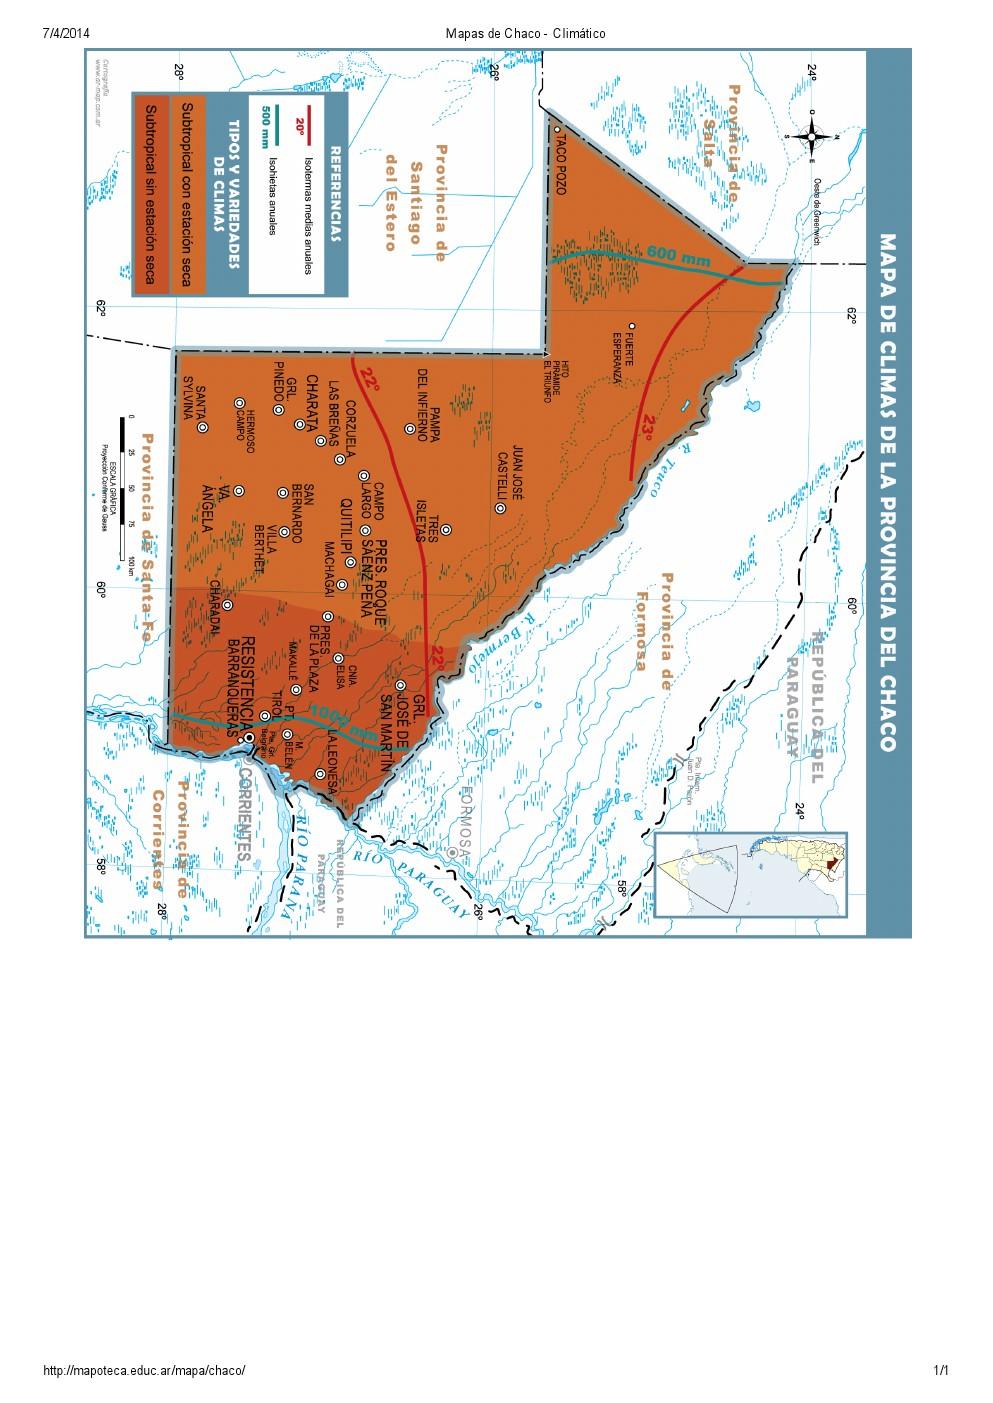 Mapa climático del Chaco. Mapoteca de Educ.ar